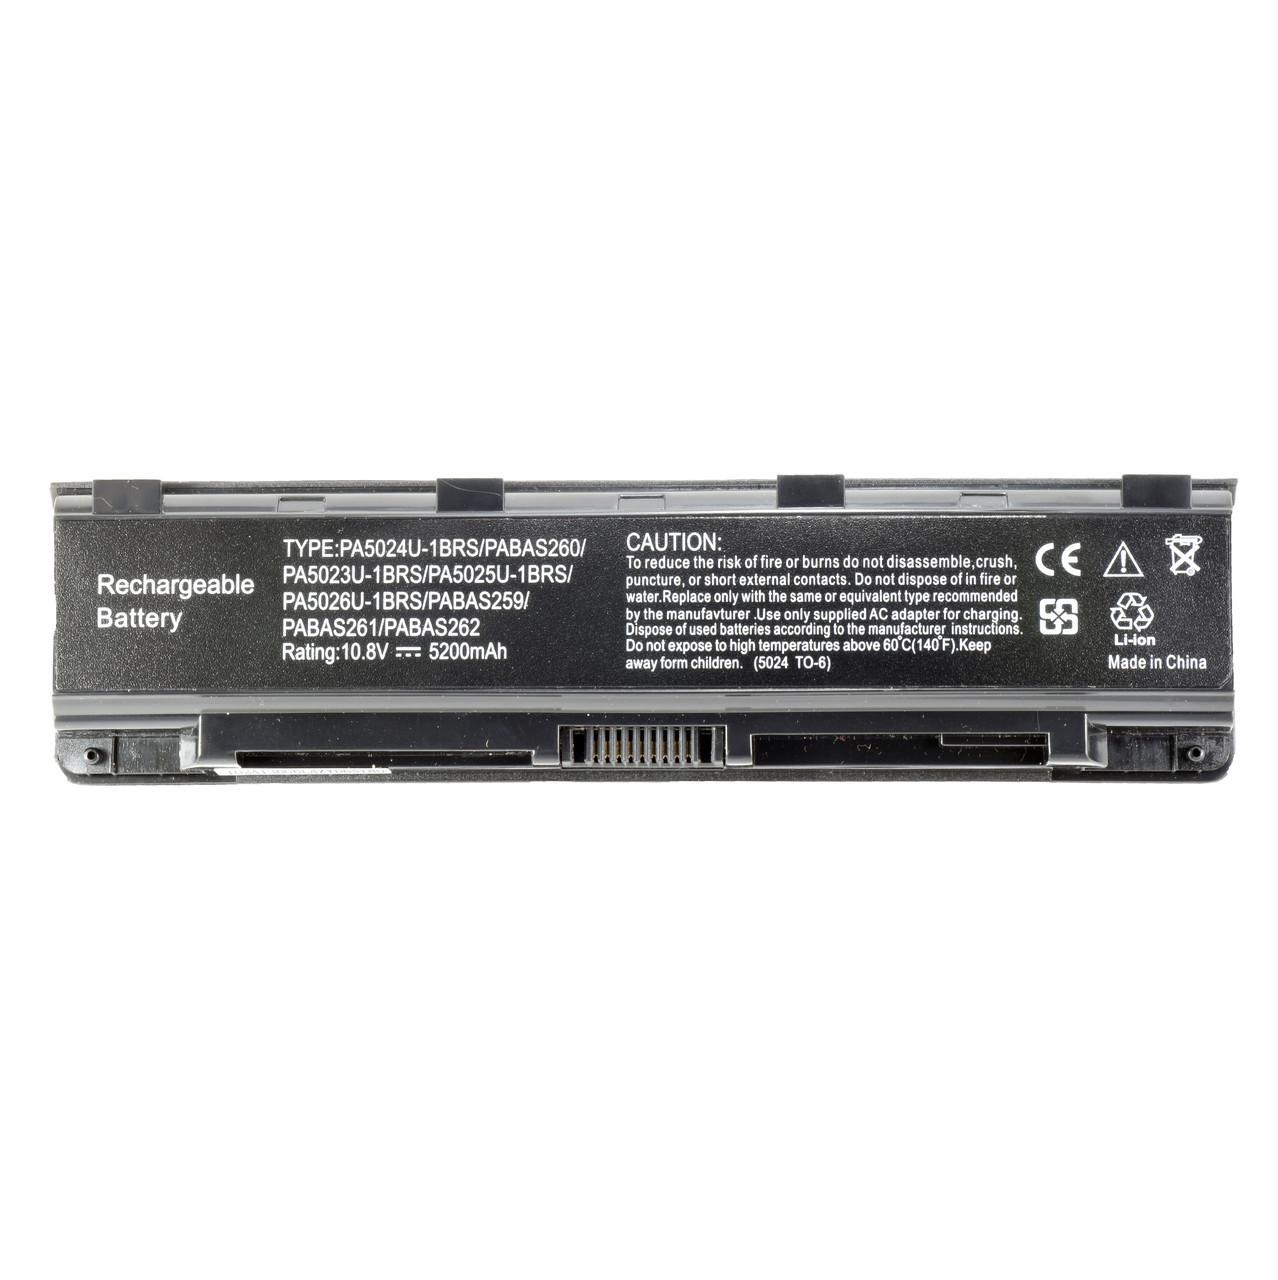 Батарея для ноутбука PABAS260 PABAS261 PABAS262 PA5027U-1BRS PA5110U-1BRS PABAS263